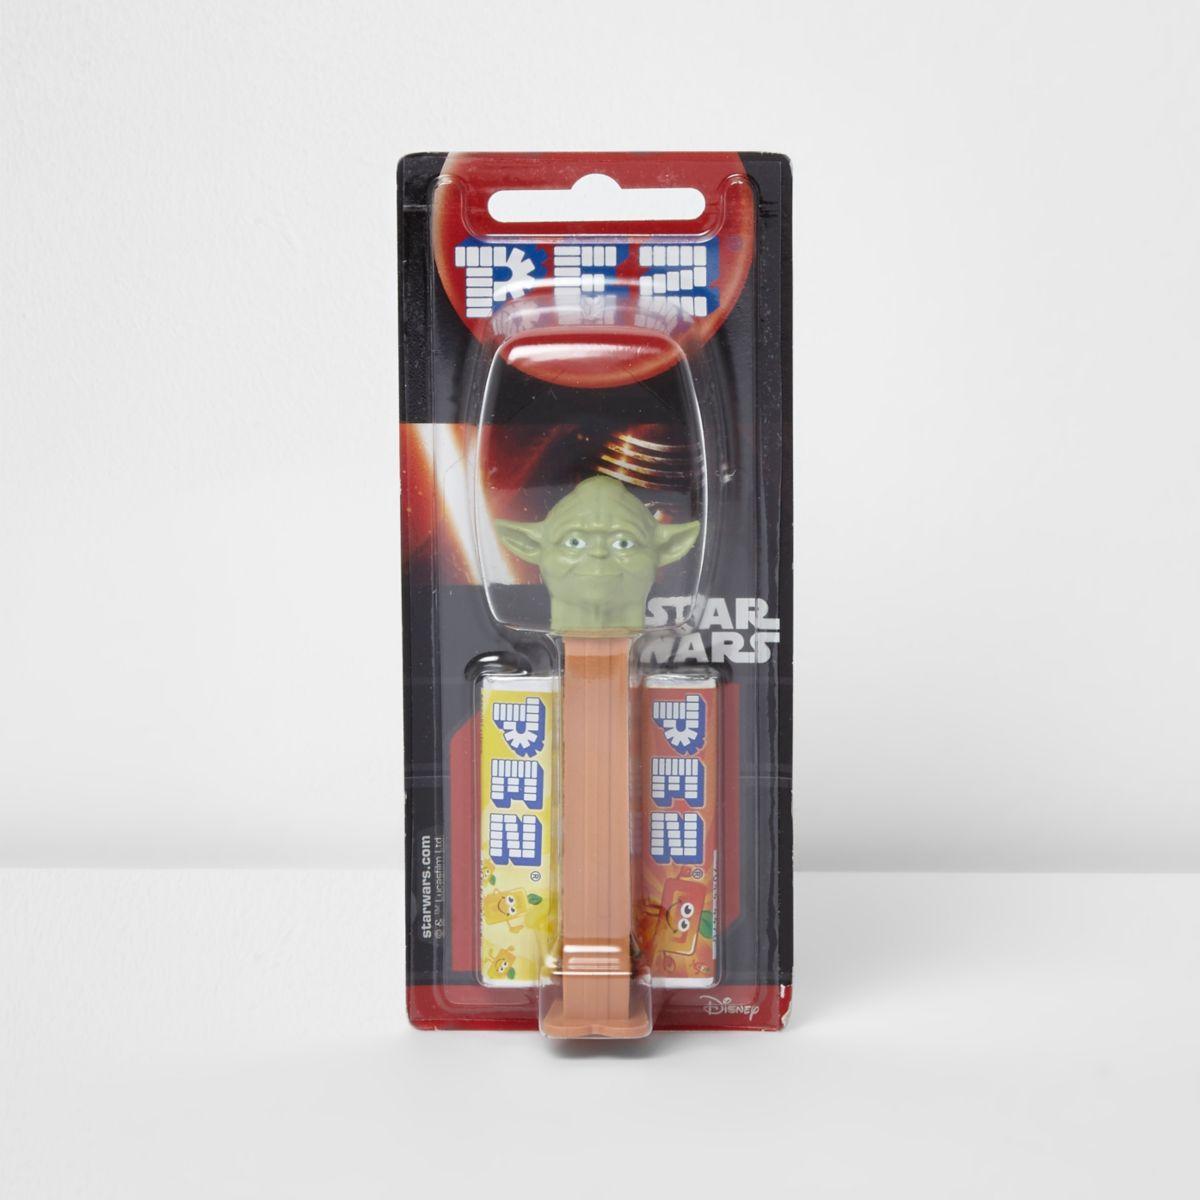 White Pez Star Wars dispensers